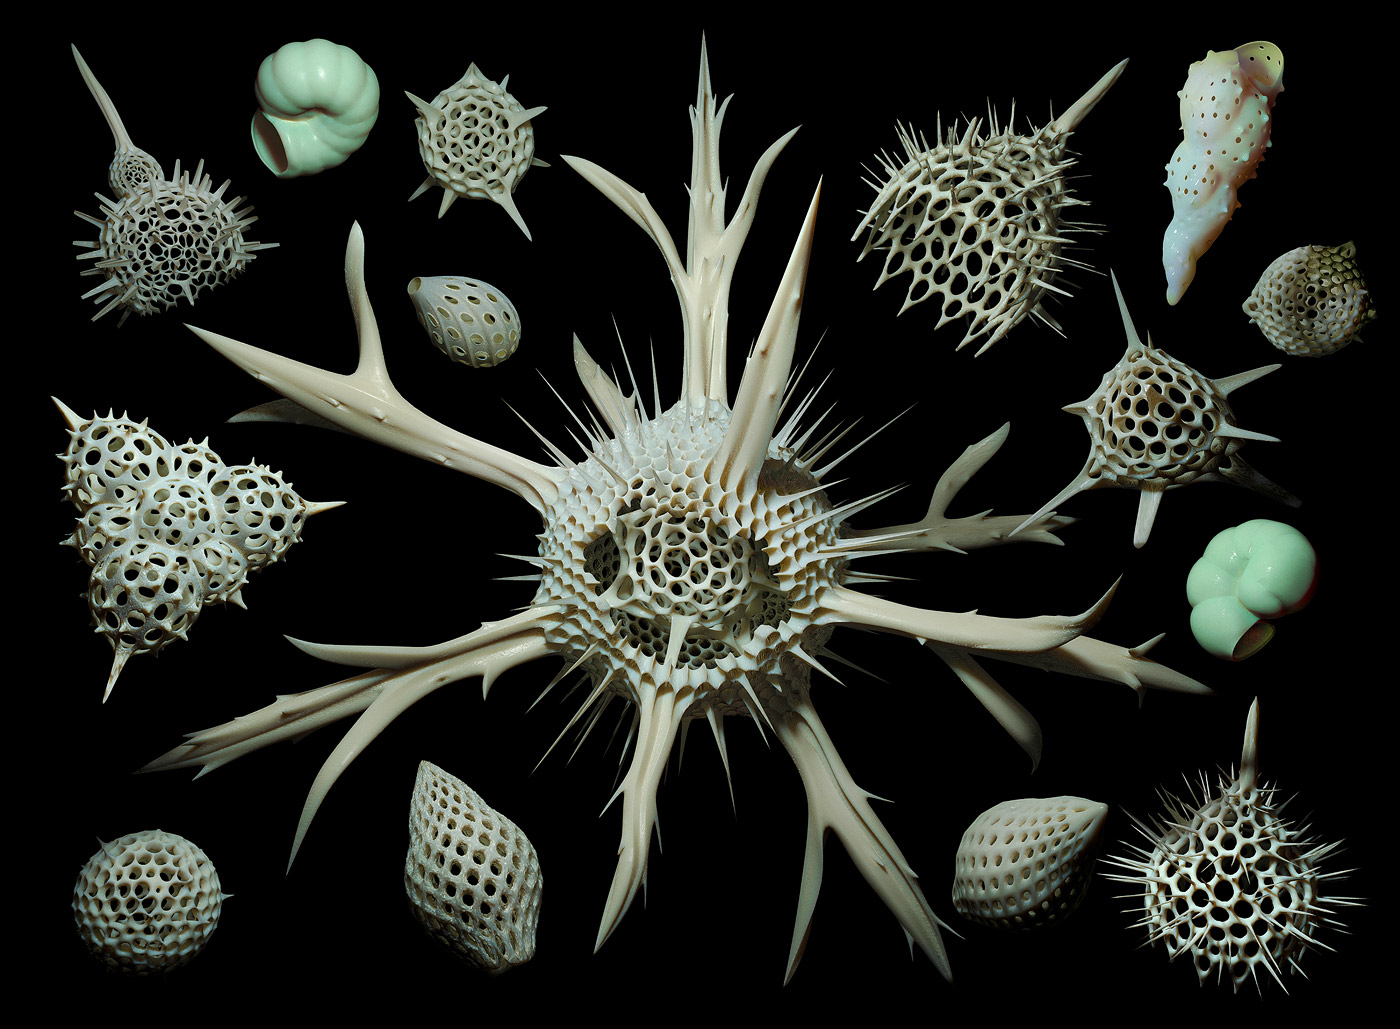 Radiolaria And Foraminifera By Eldarzakirov On Deviantart